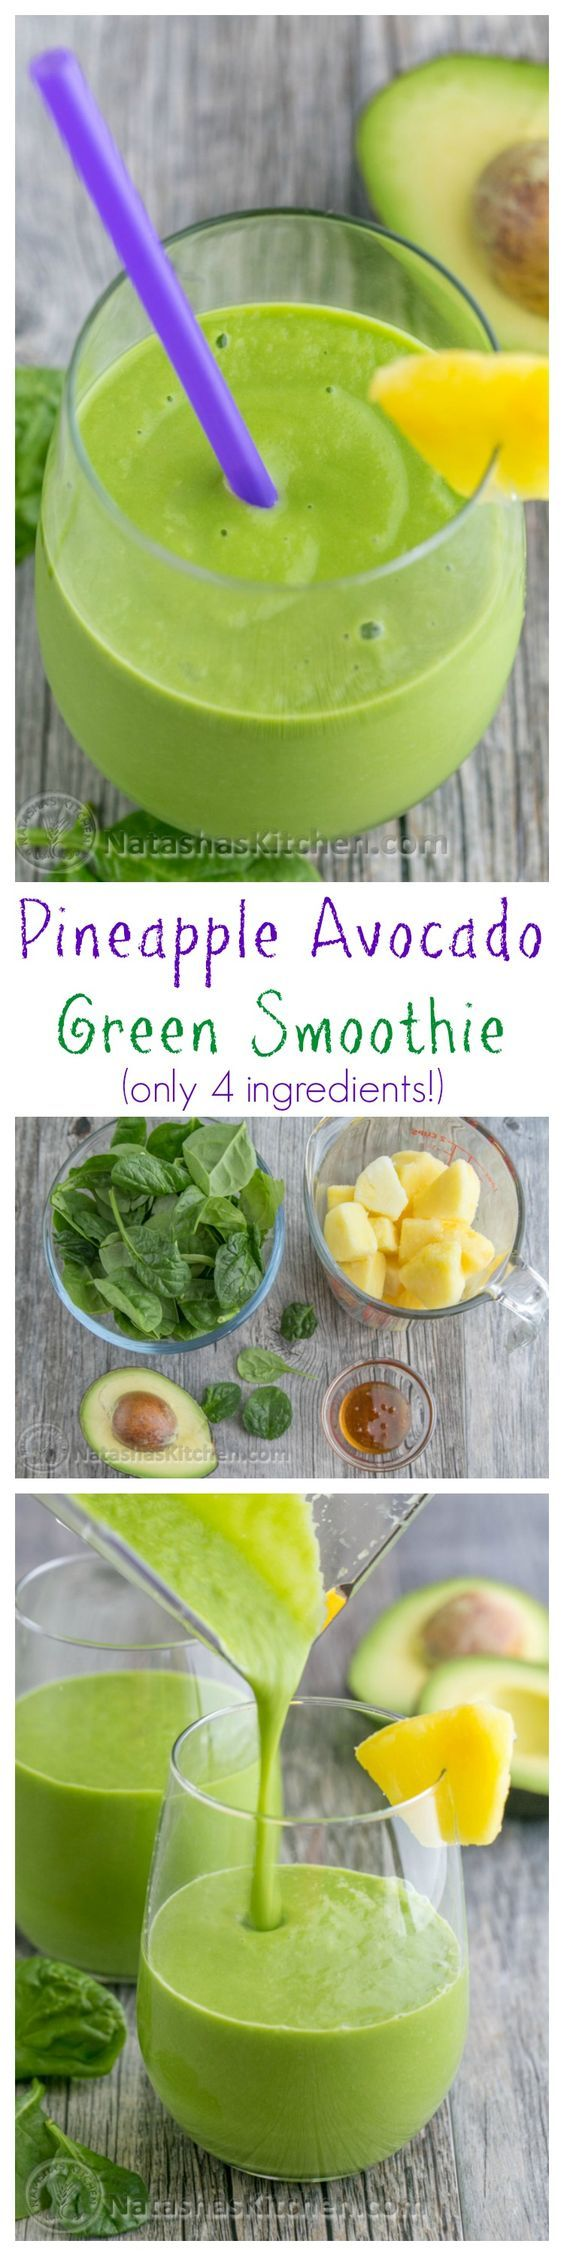 Pineapple Avocado Green Smoothie